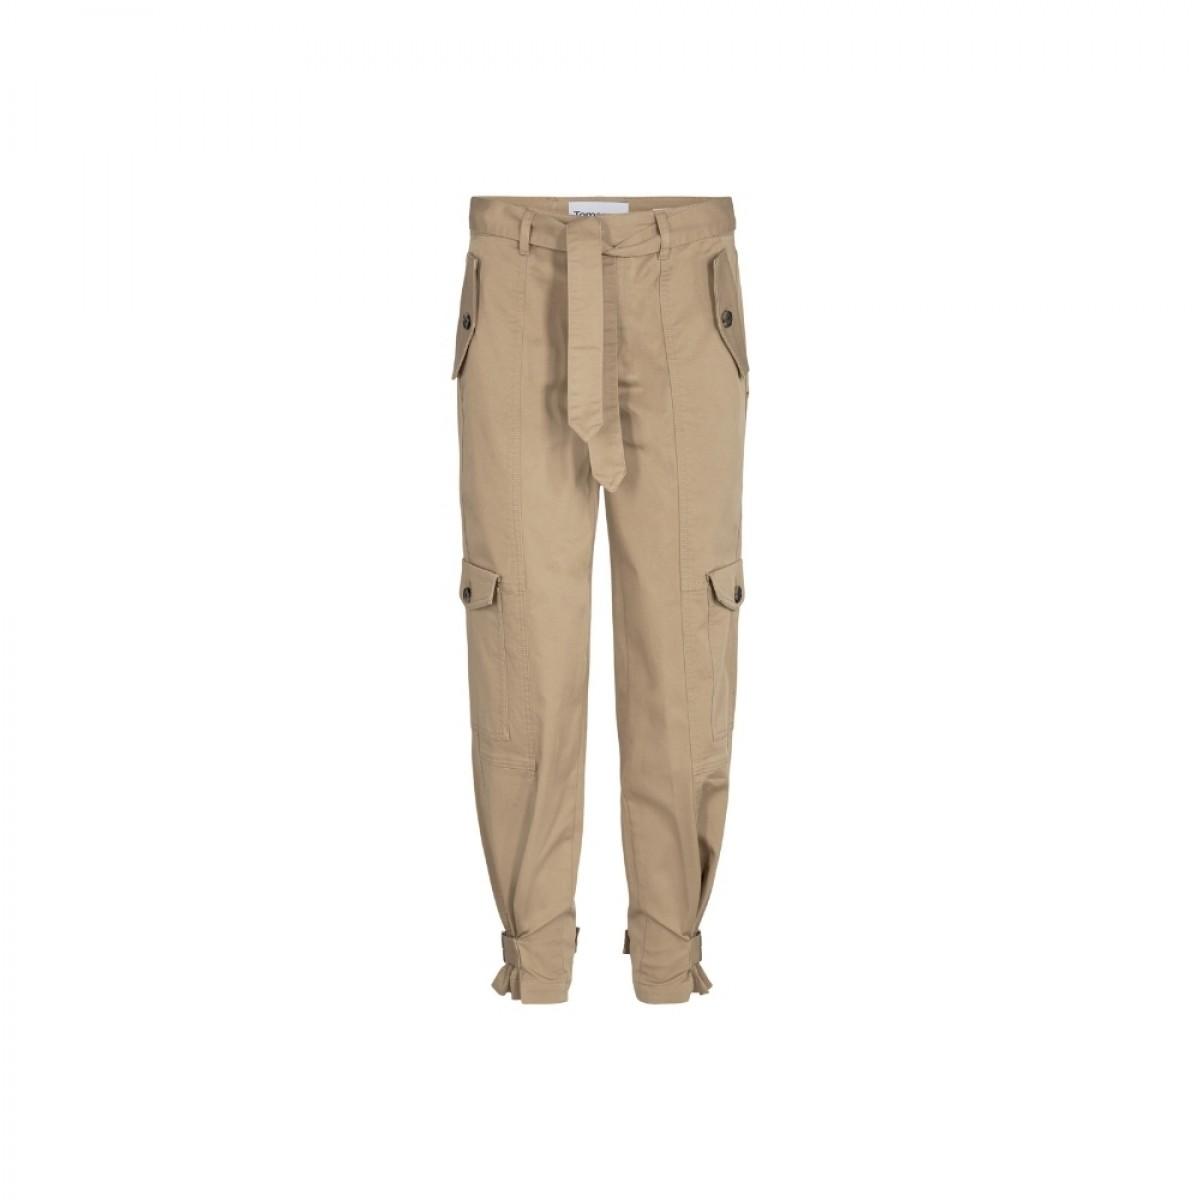 brown cargo pants - camel